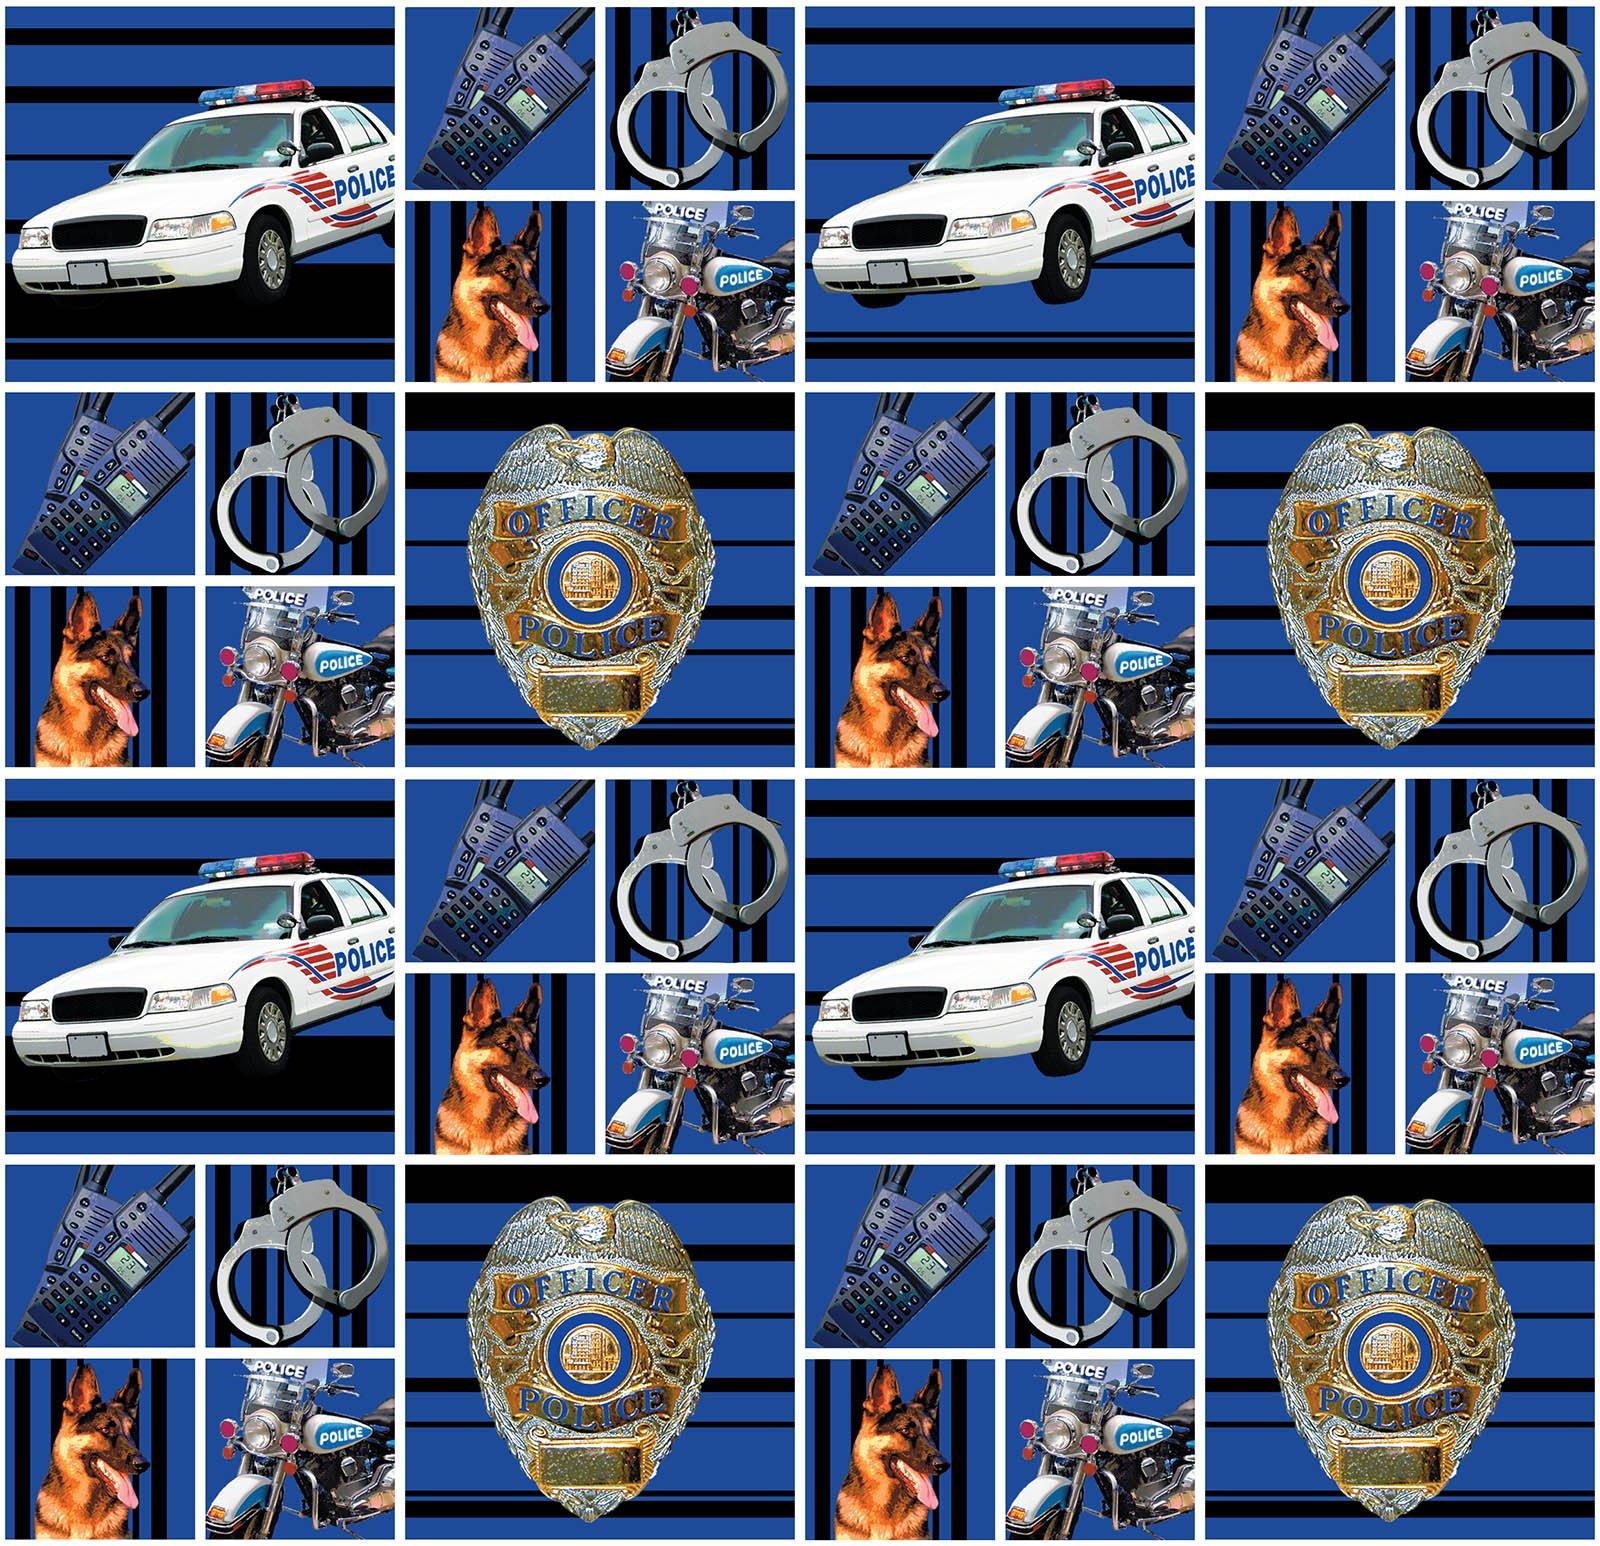 Sykel-Police Cotton 1115 Police Cotton/Block